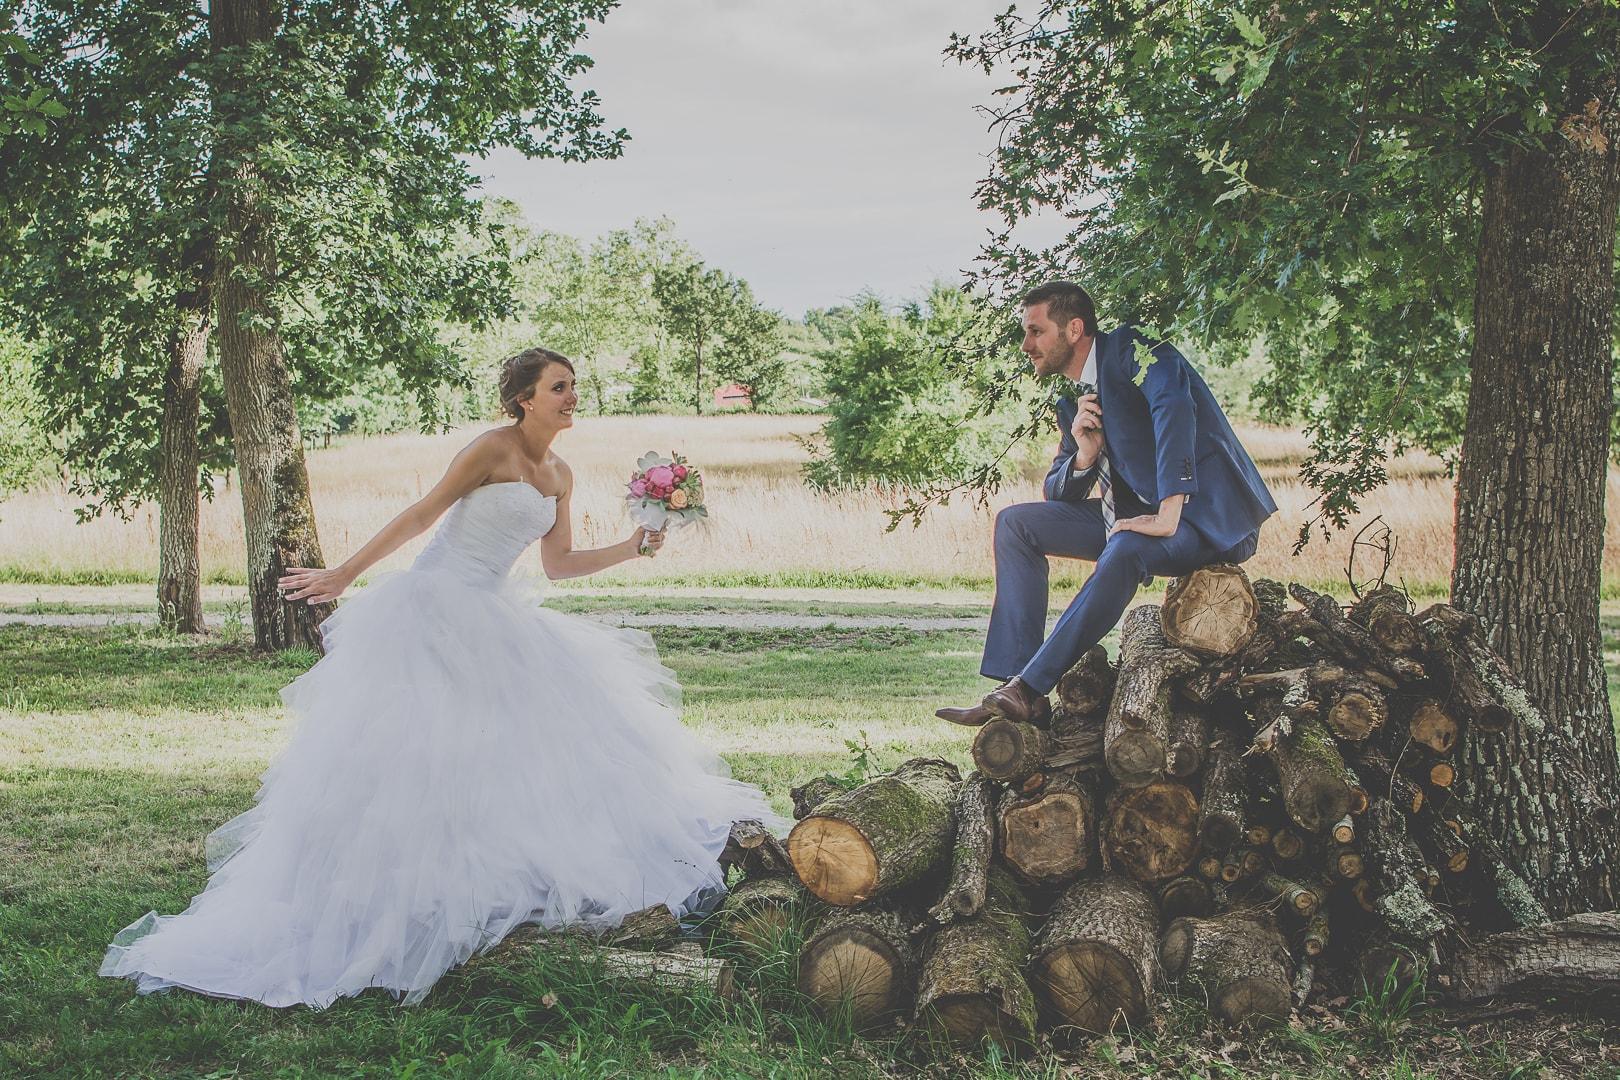 trezors-photography-photographe-professionnel-toulouse-31-mariage-reportage-photo-seance-couple-jessica